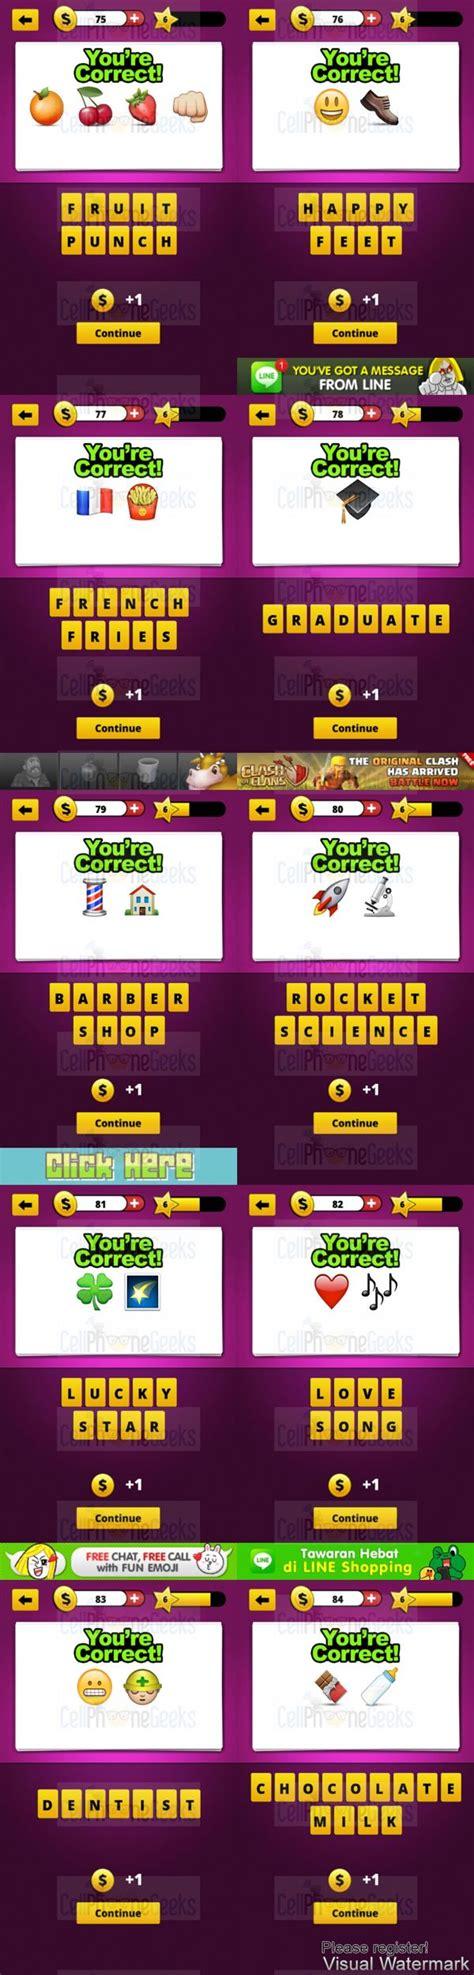 Guess The Emoji Level 53 Answers | www.pixshark.com ... Guess The Emoji Level 53